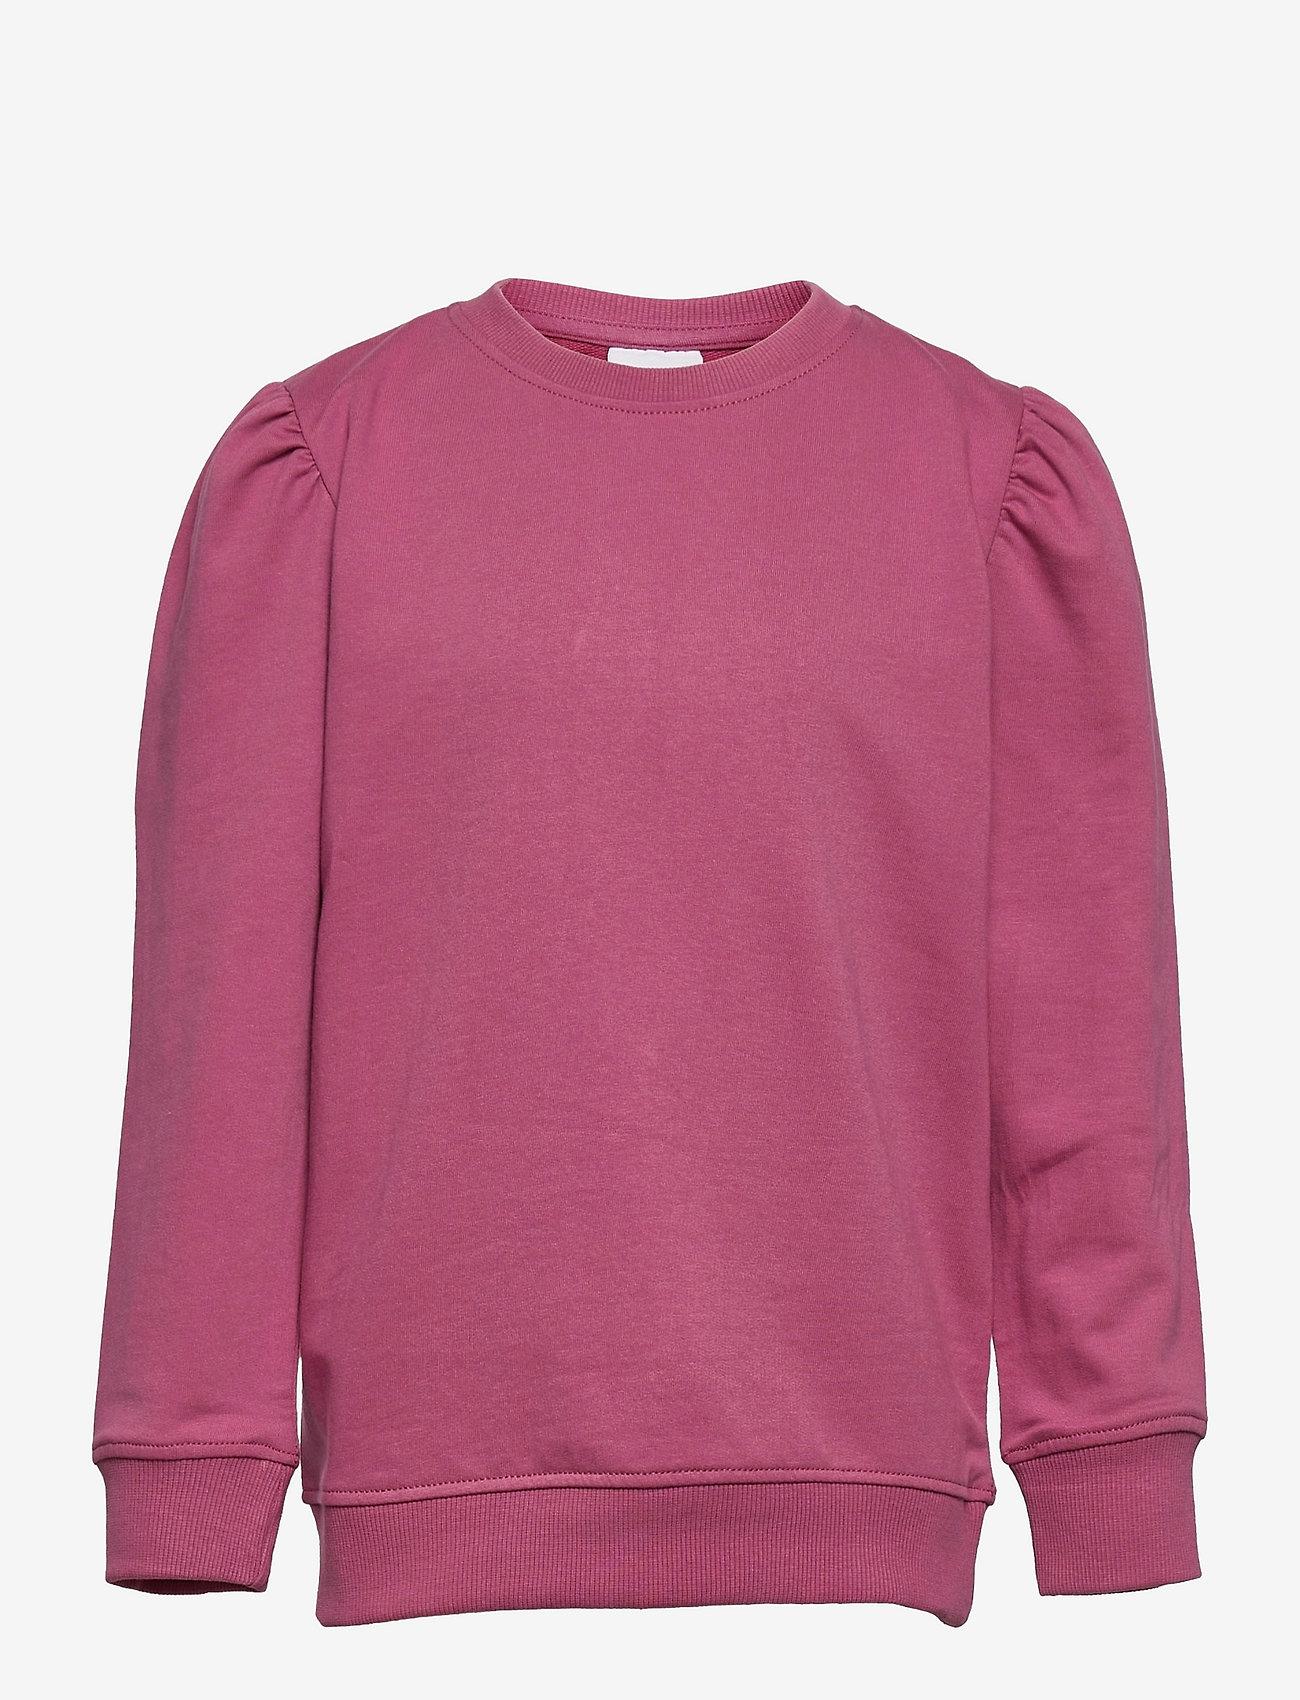 The New - EXIT PUFF SWEATSHIRT - sweatshirts - heather rose - 0